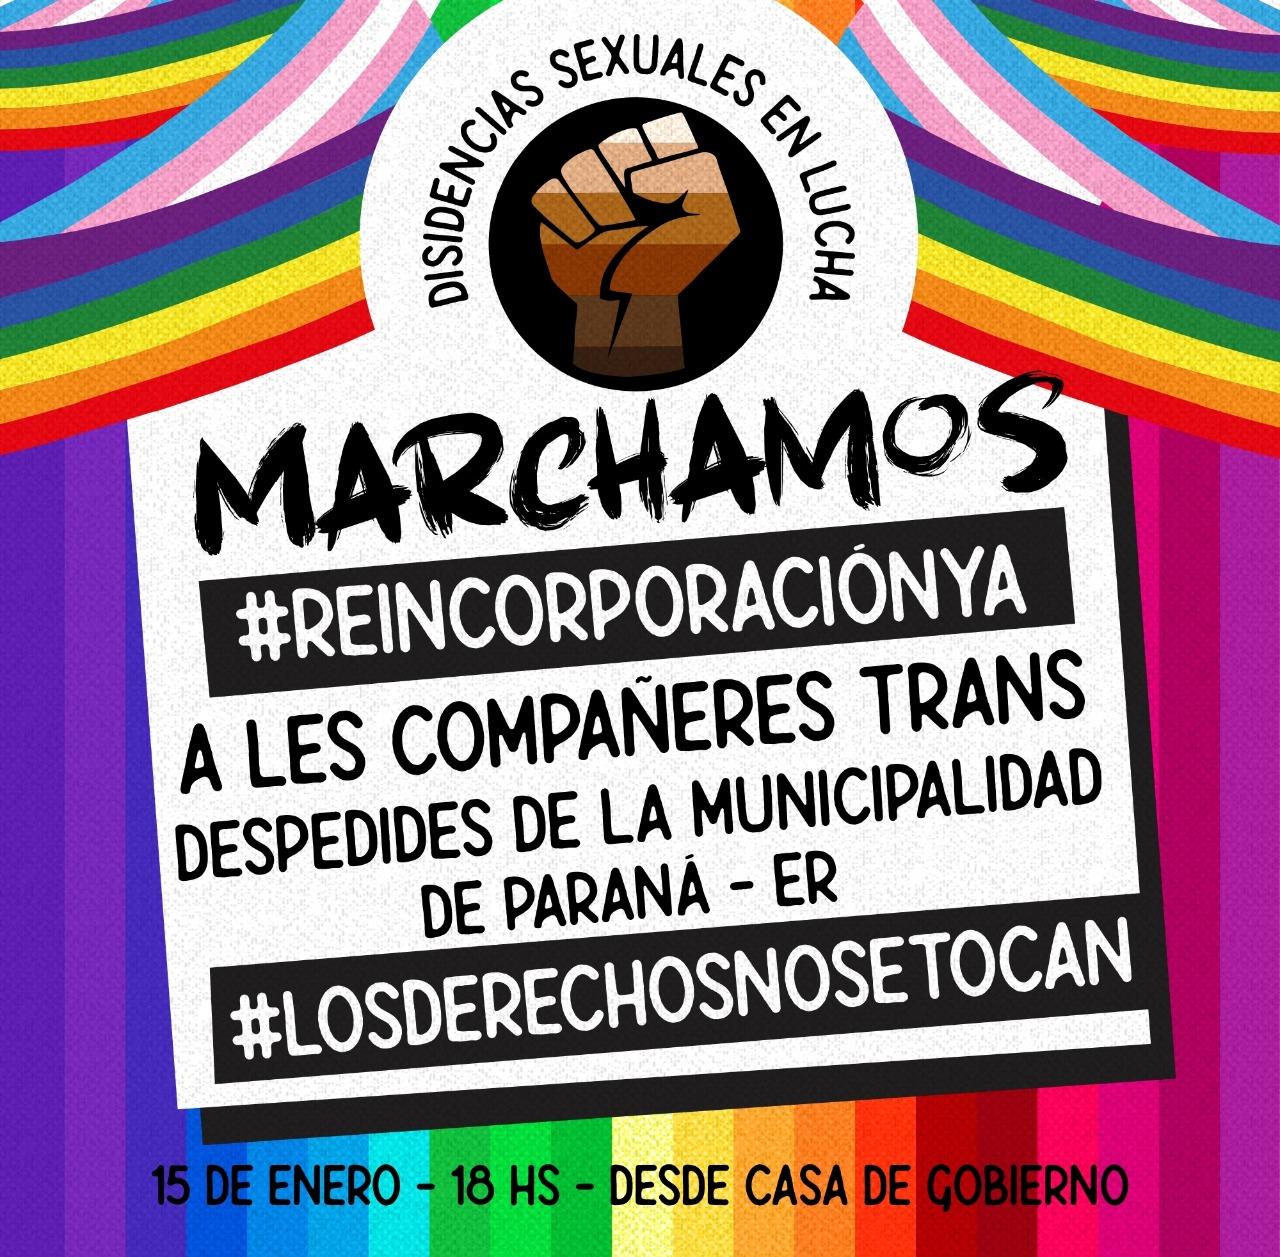 Transfobia municipal en Paraná